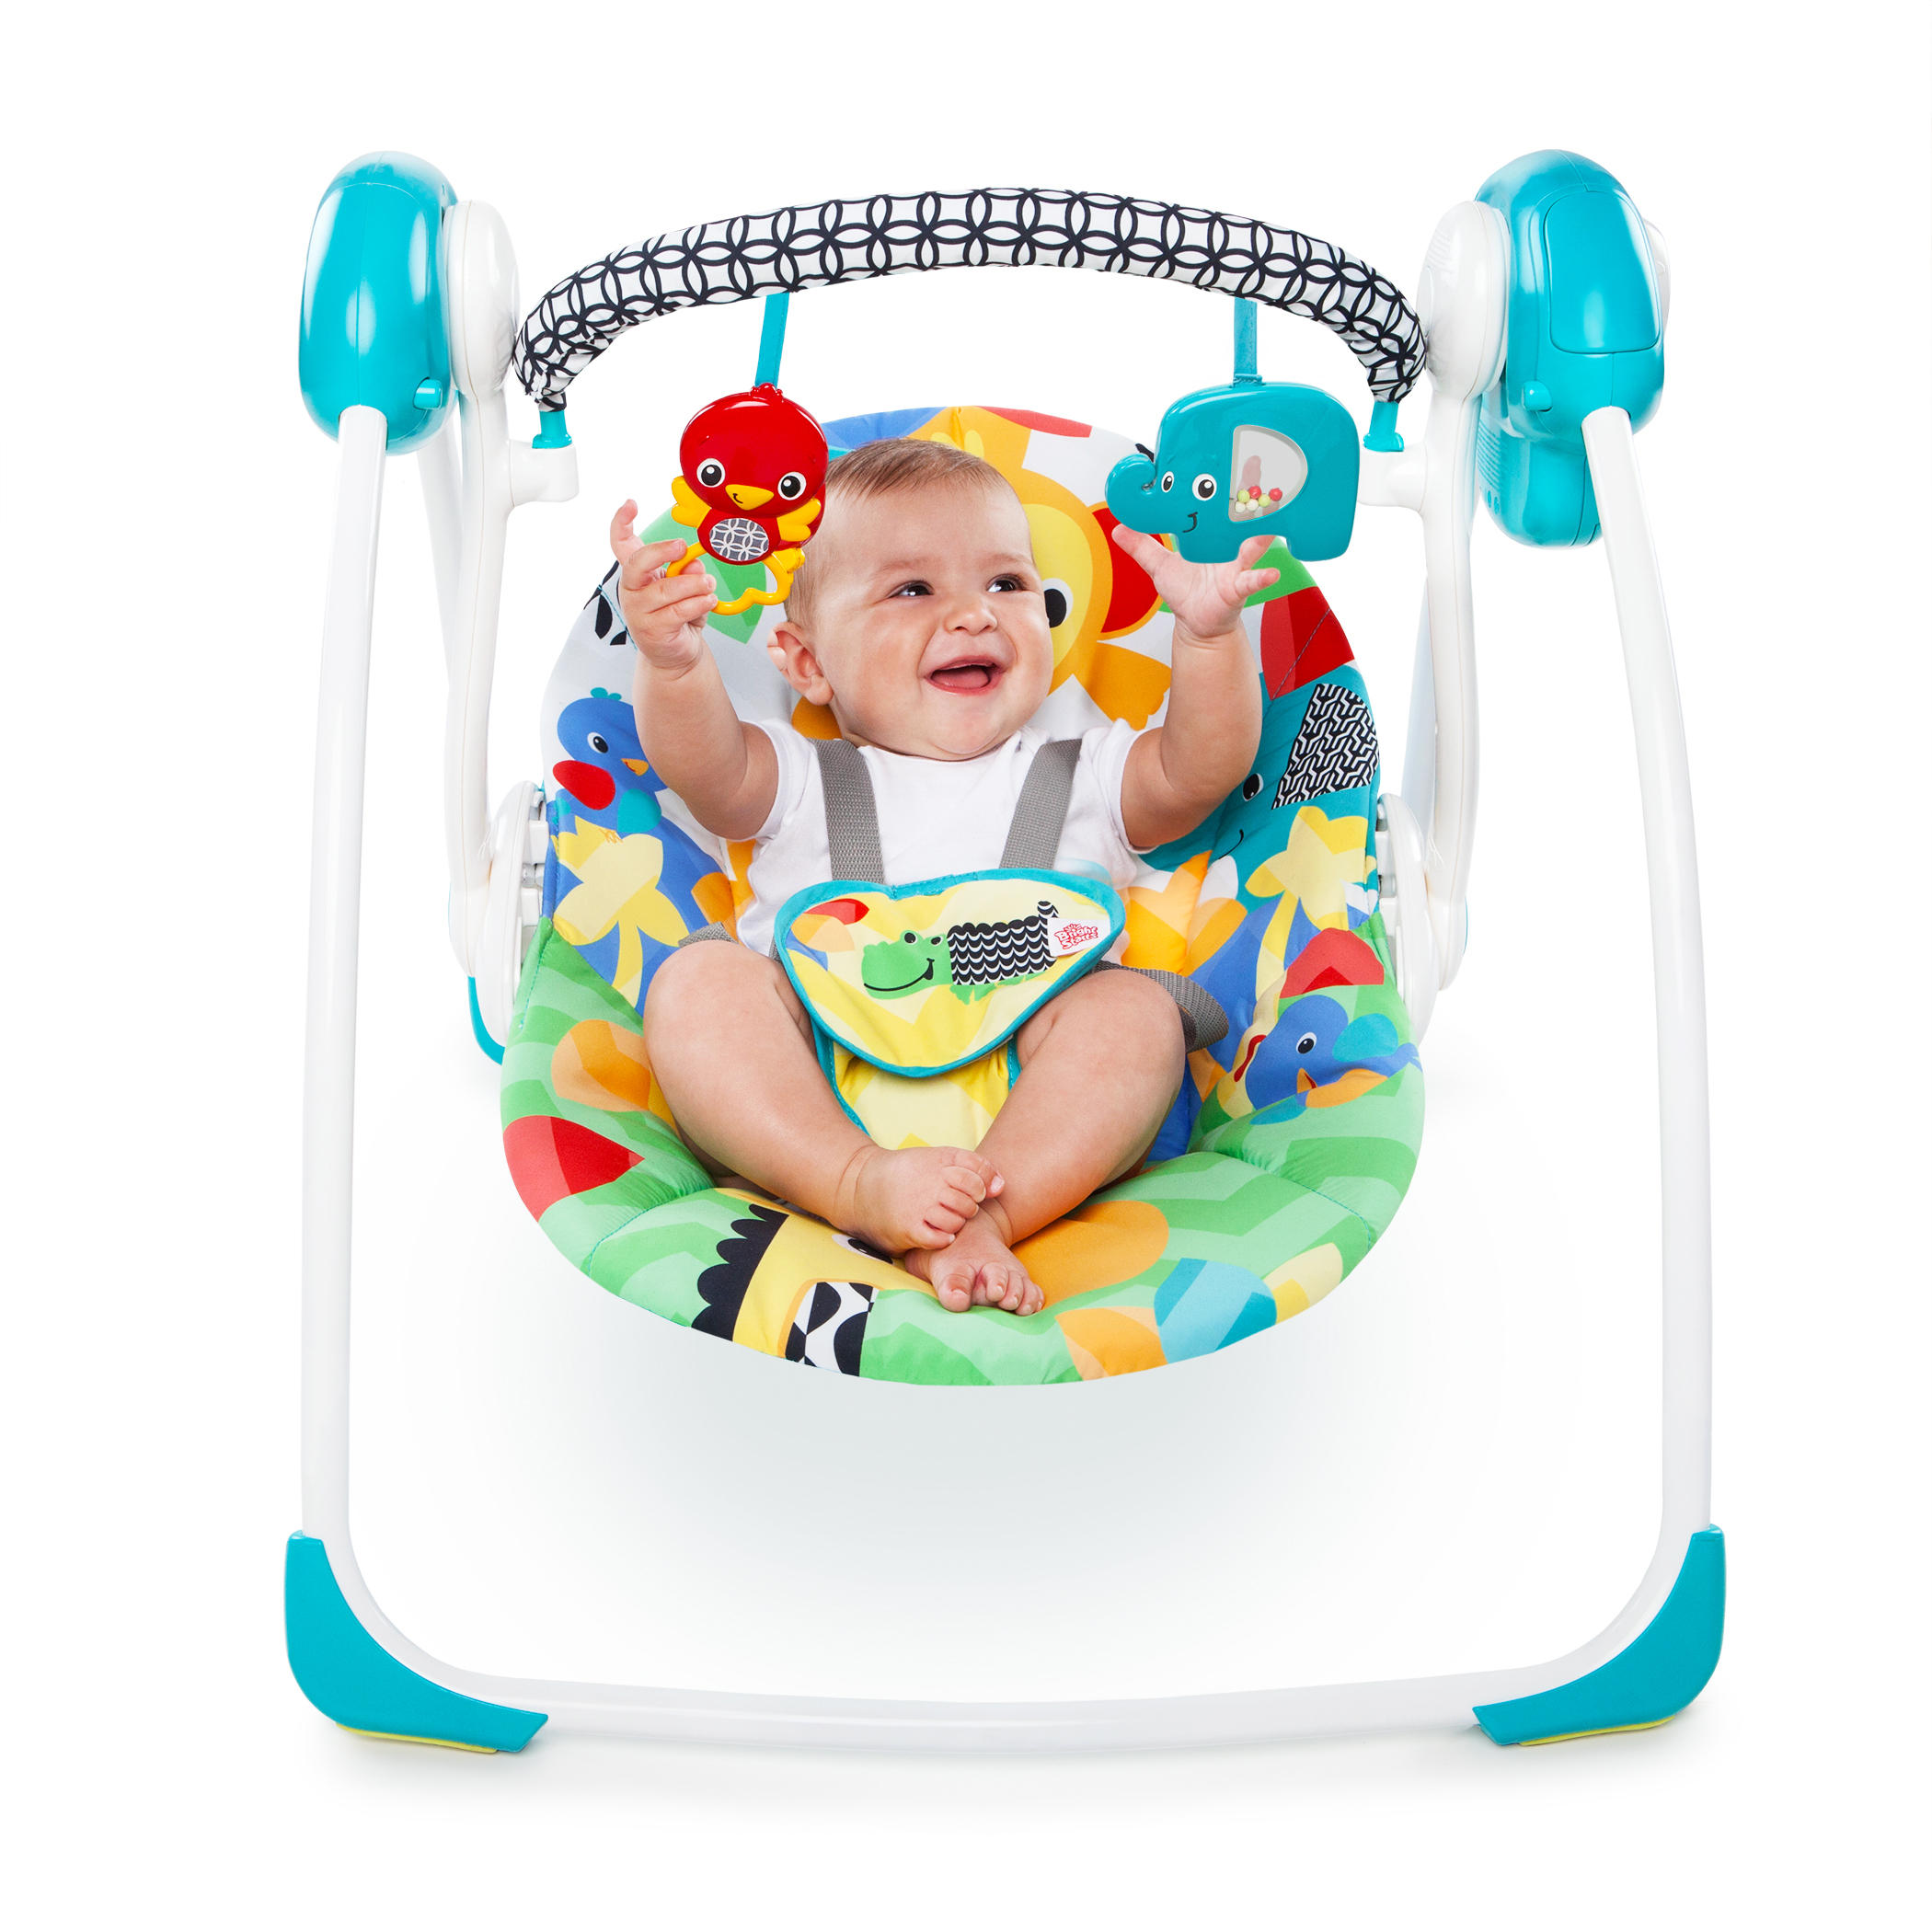 Portable Swing - Safari Smiles™